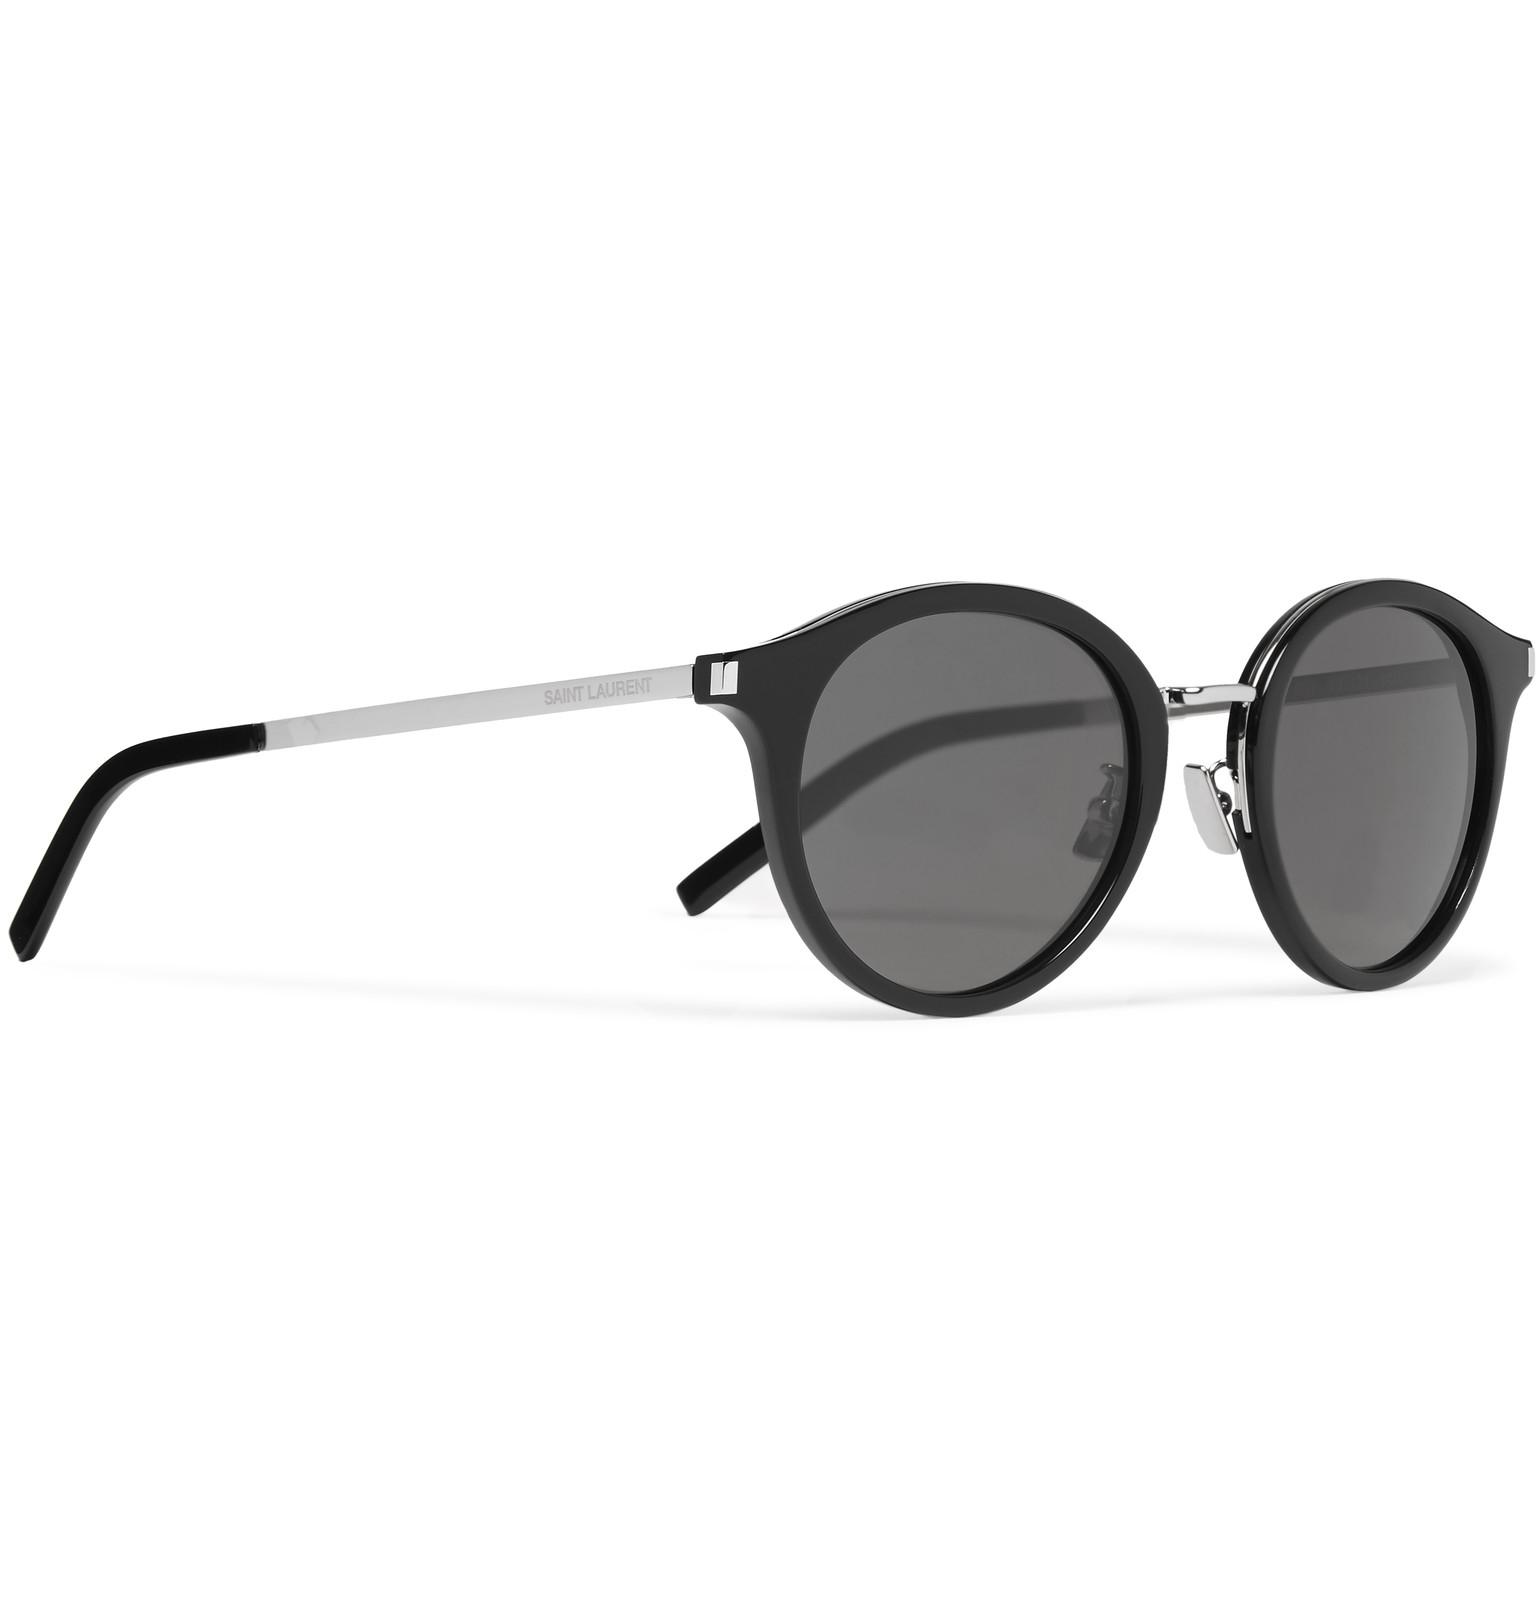 e53cf306ec4 Saint Laurent Round-frame Acetate And Silver-tone Sunglasses in ...